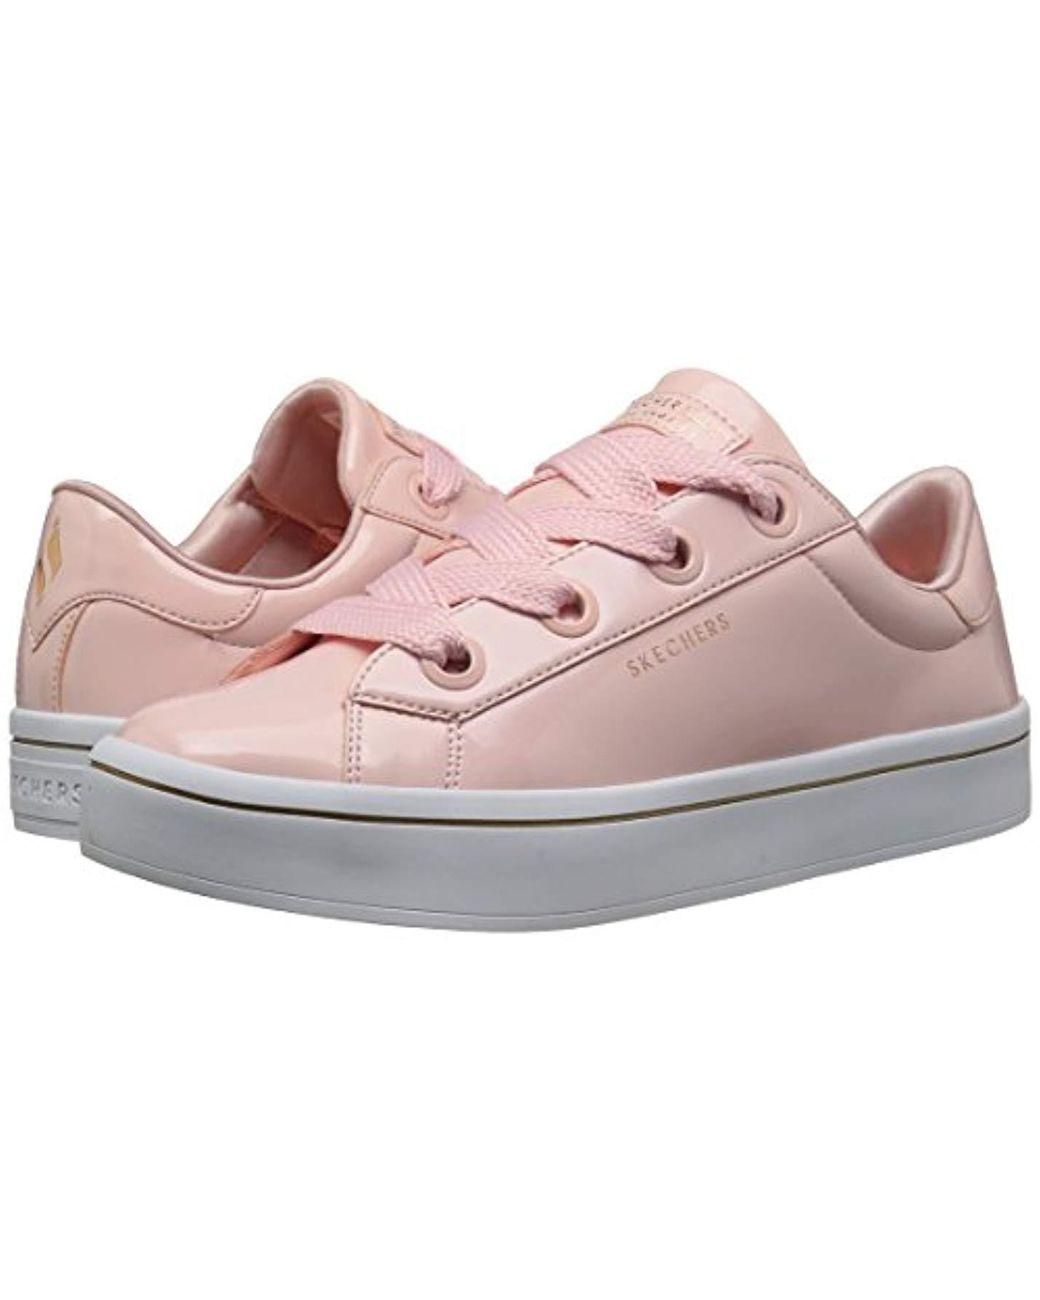 Women's Pink Hi lite patent Lace Sneaker